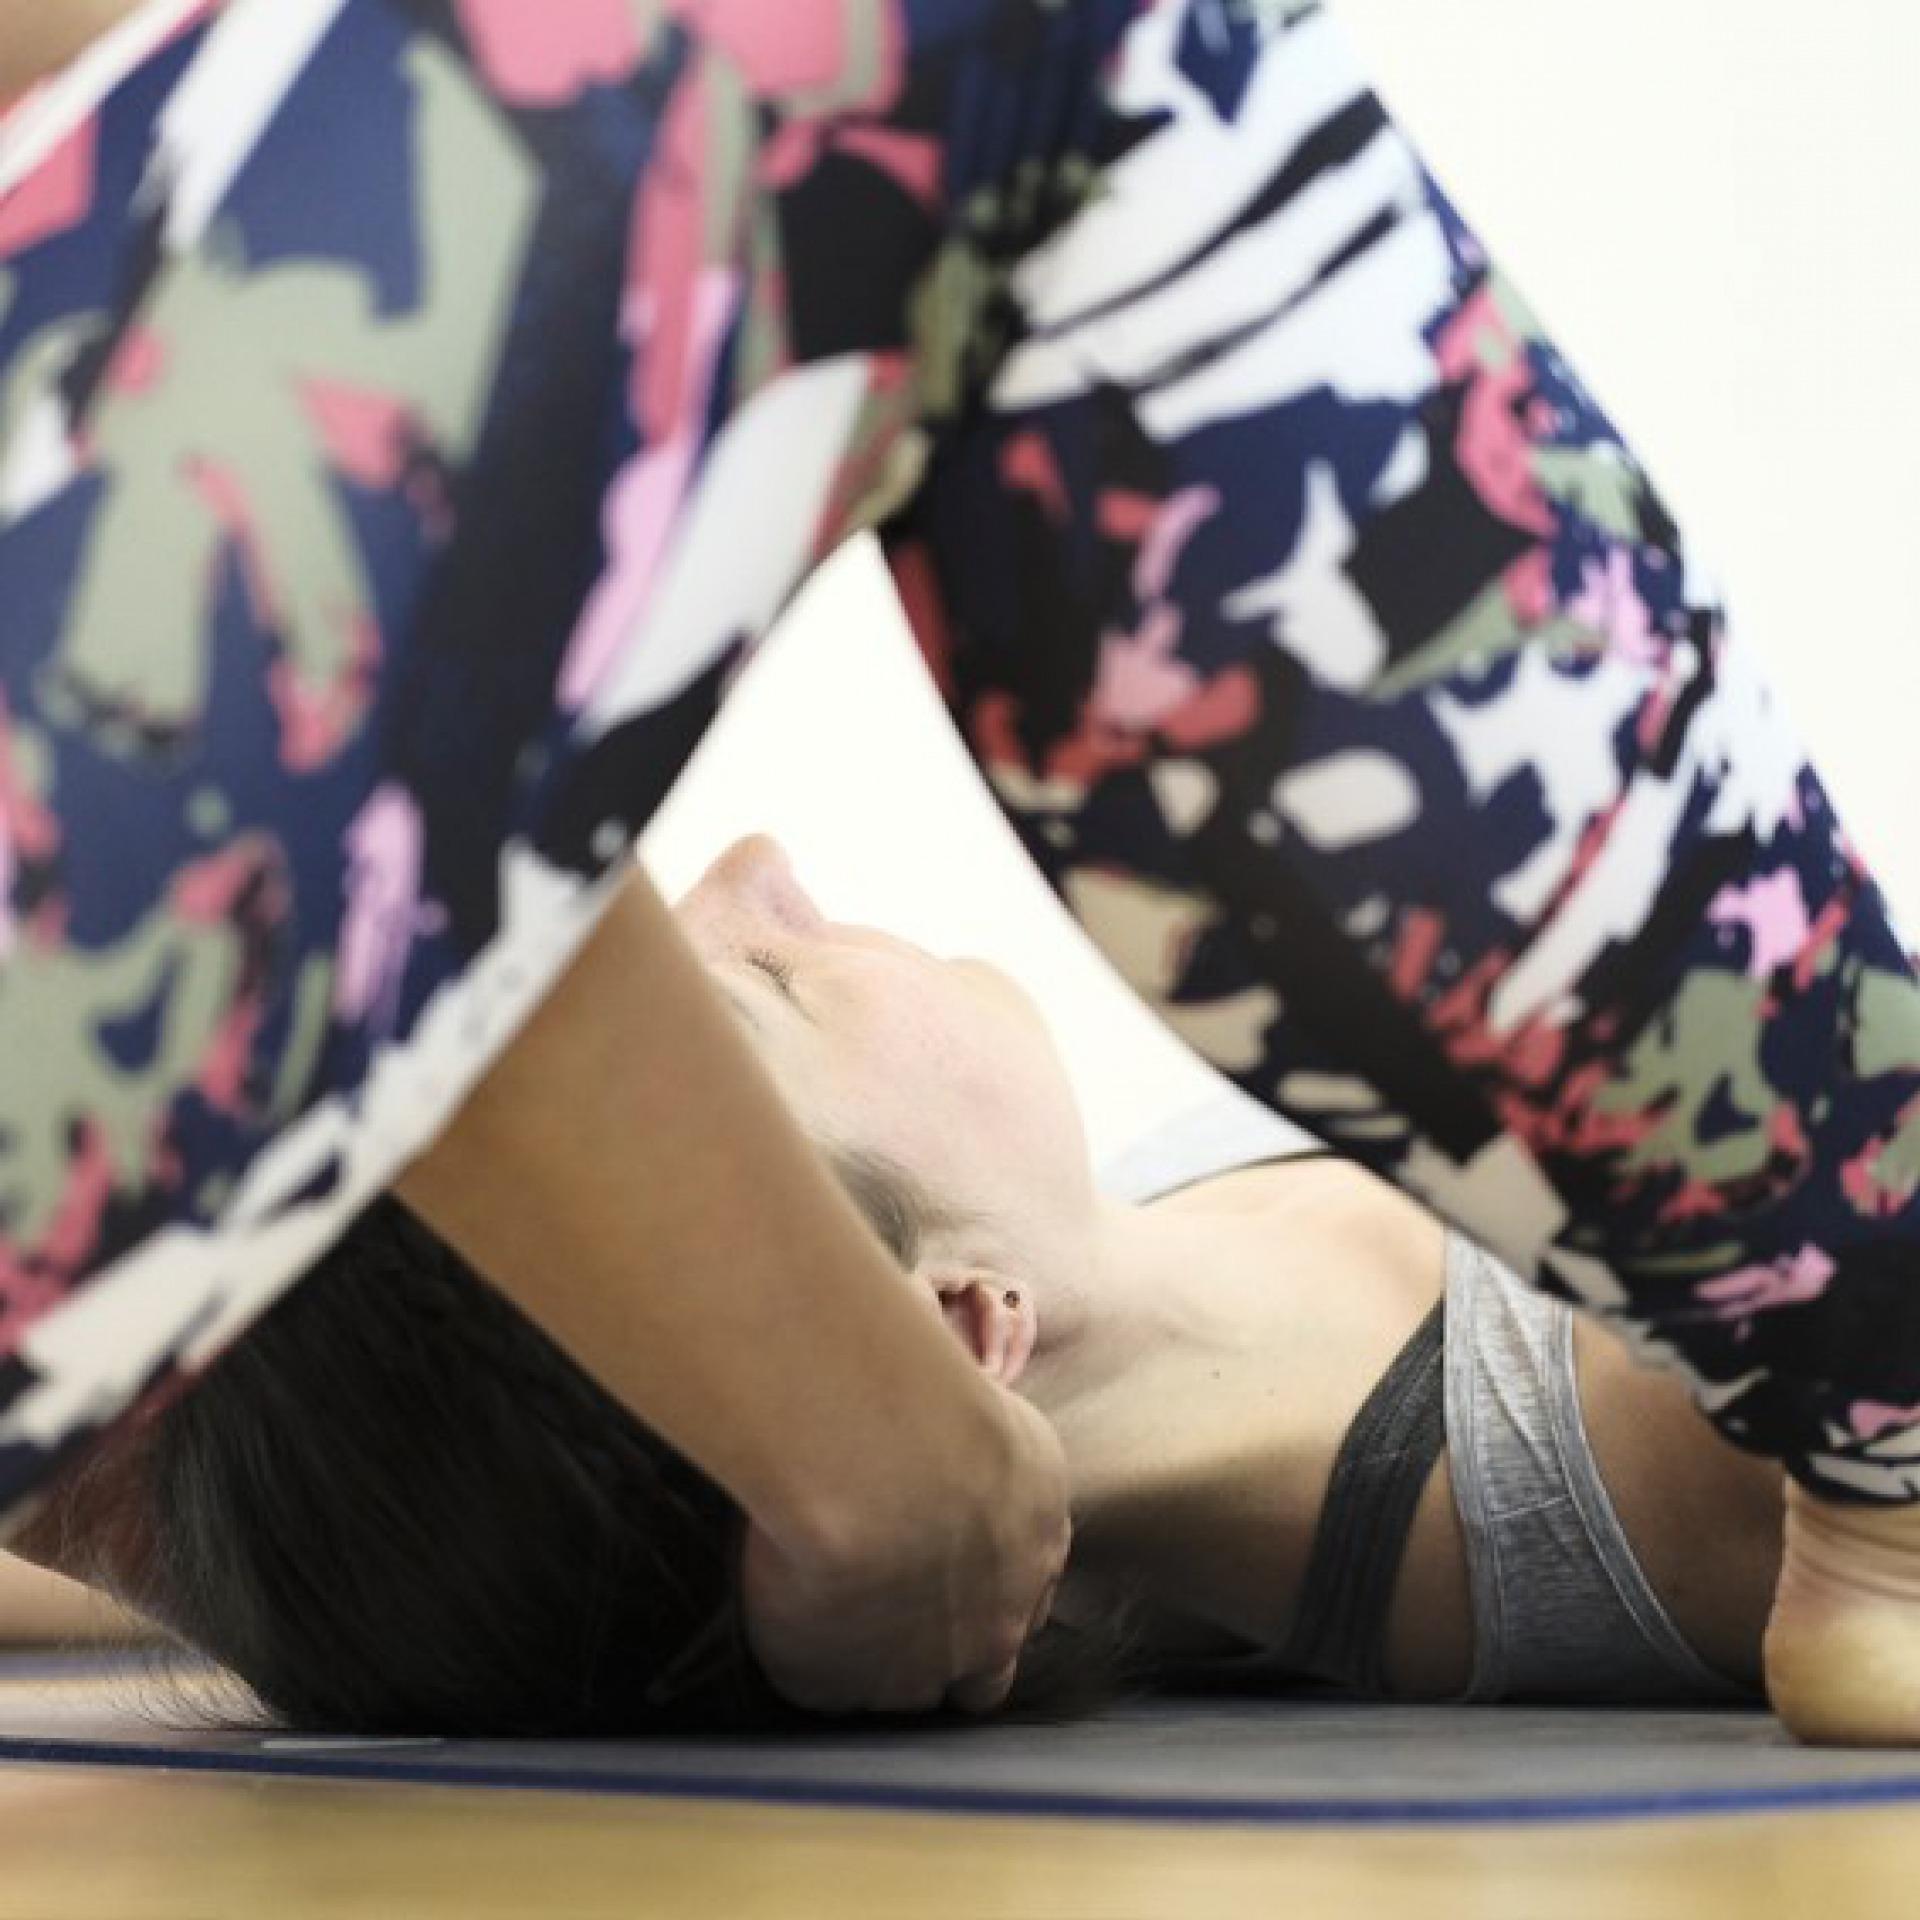 nikolaus forrest yoga wochenende walk in beauty beach. Black Bedroom Furniture Sets. Home Design Ideas